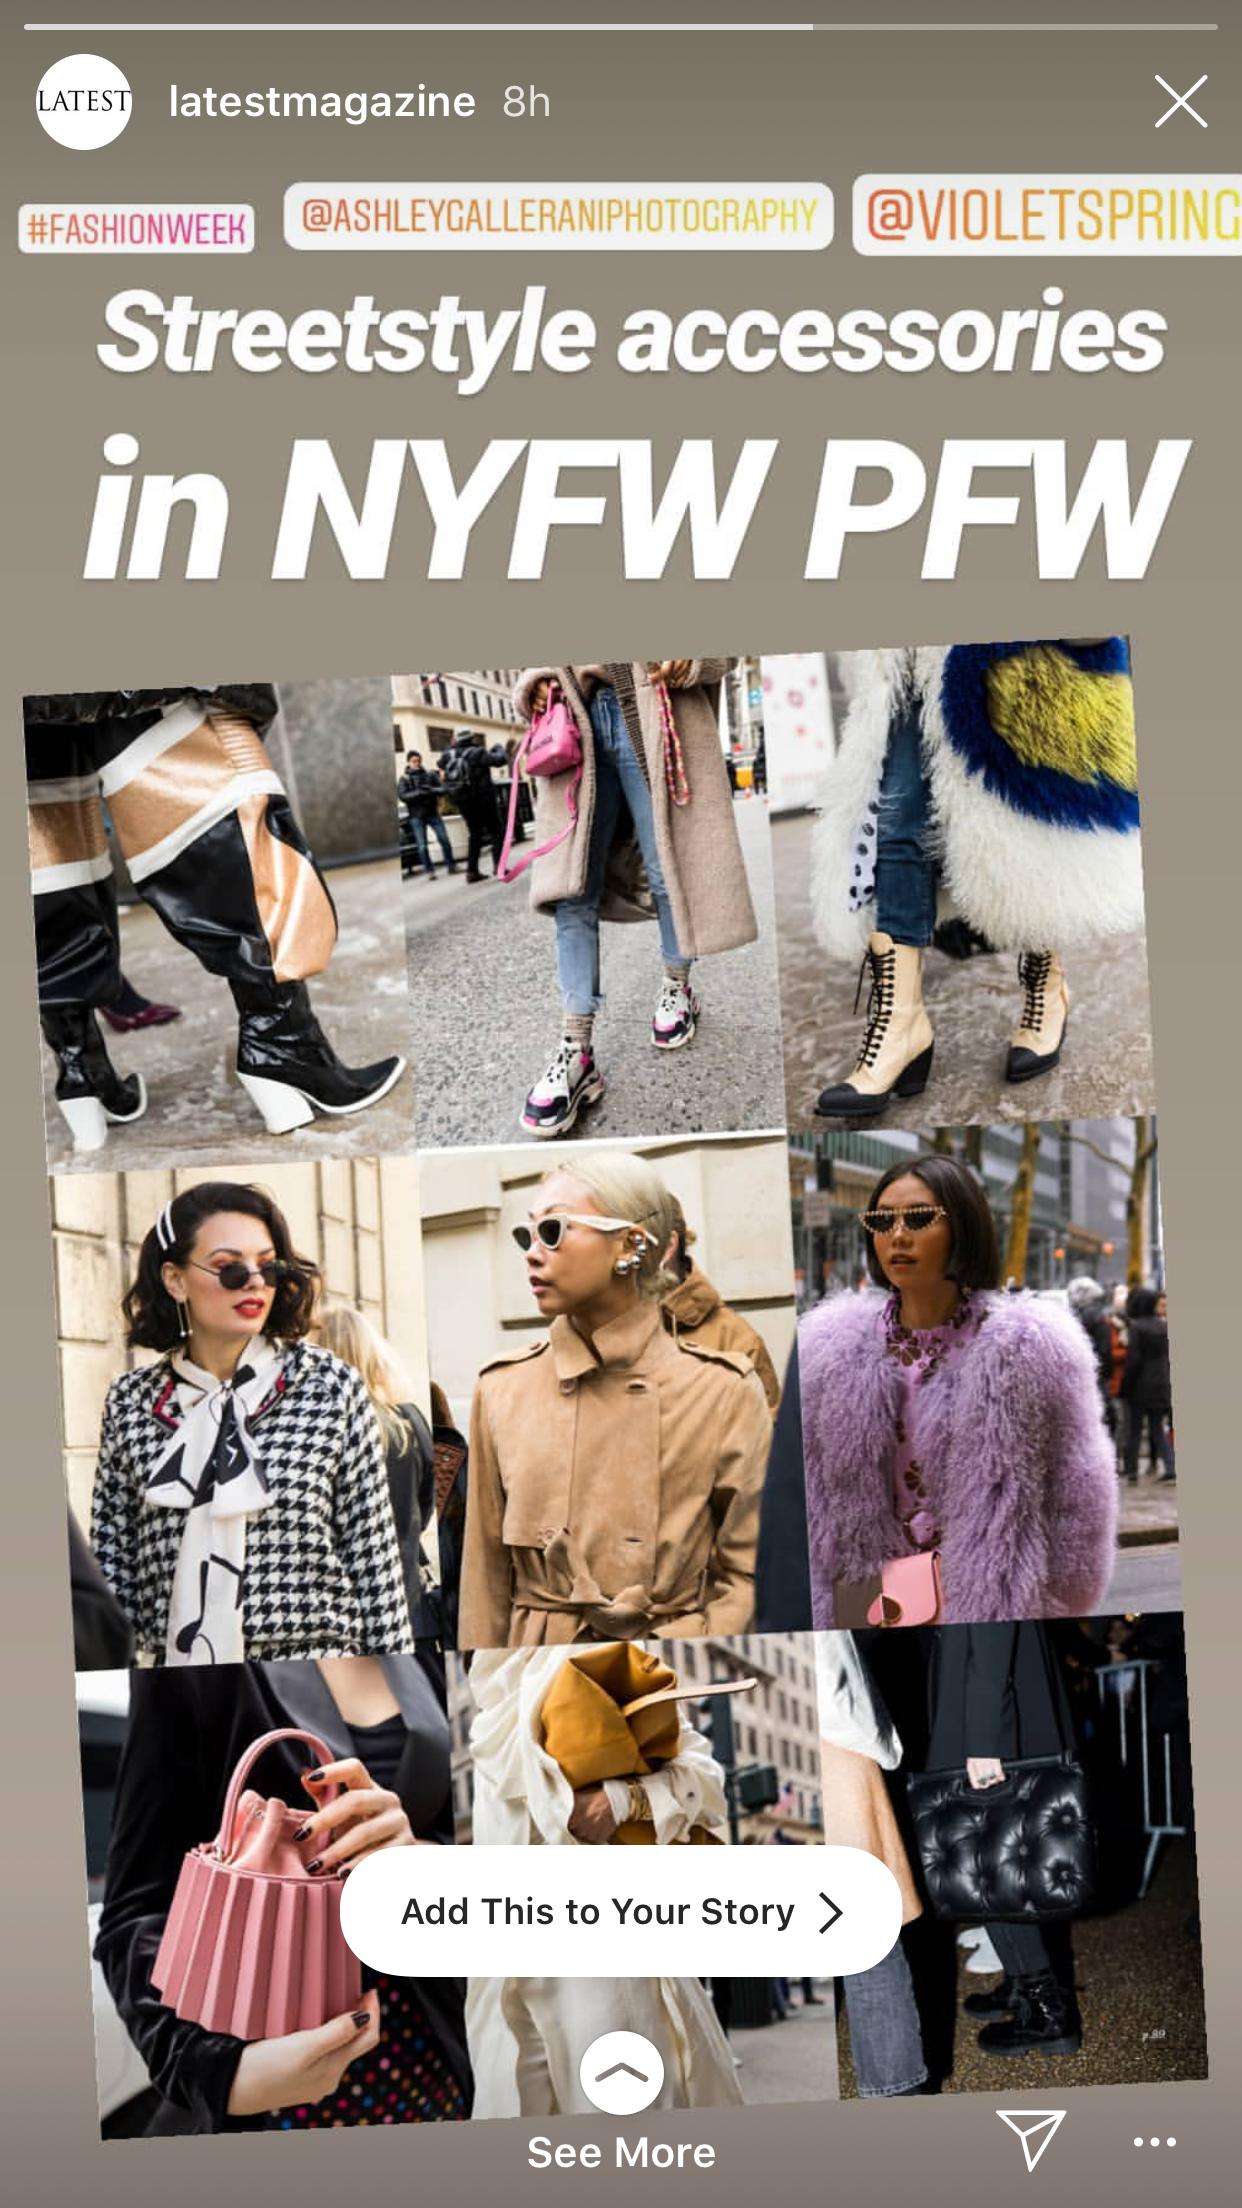 NYFW+PFW FW19 COVERAGE FOR LATEST MAGAZINE